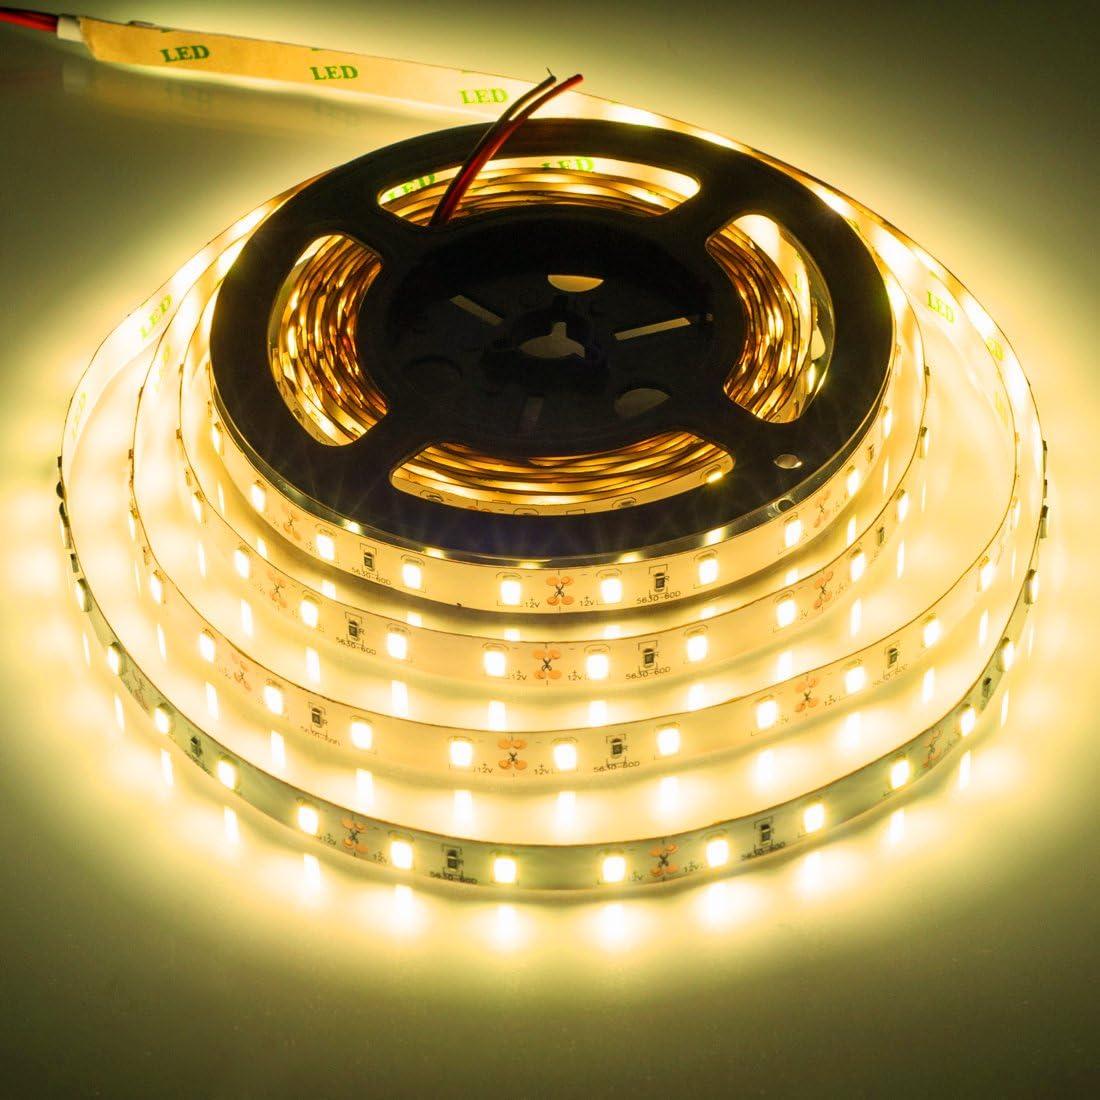 5M//16.4FT 3528 5050 5630 SMD Waterproof 300LED Strip Light String Ribbon Tape